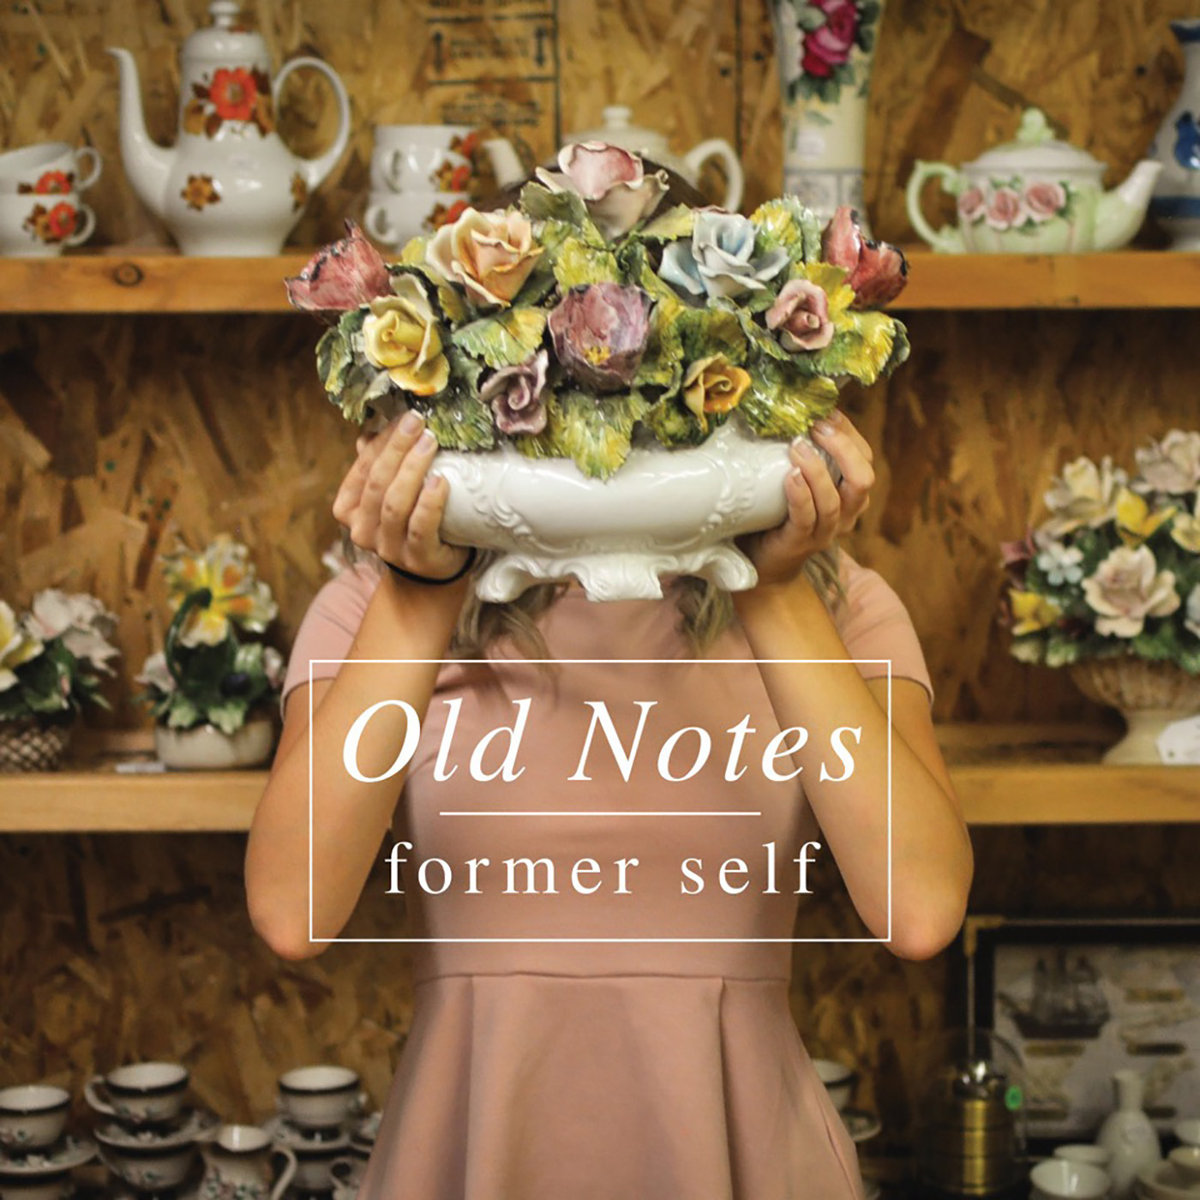 Old Notes – Former Self